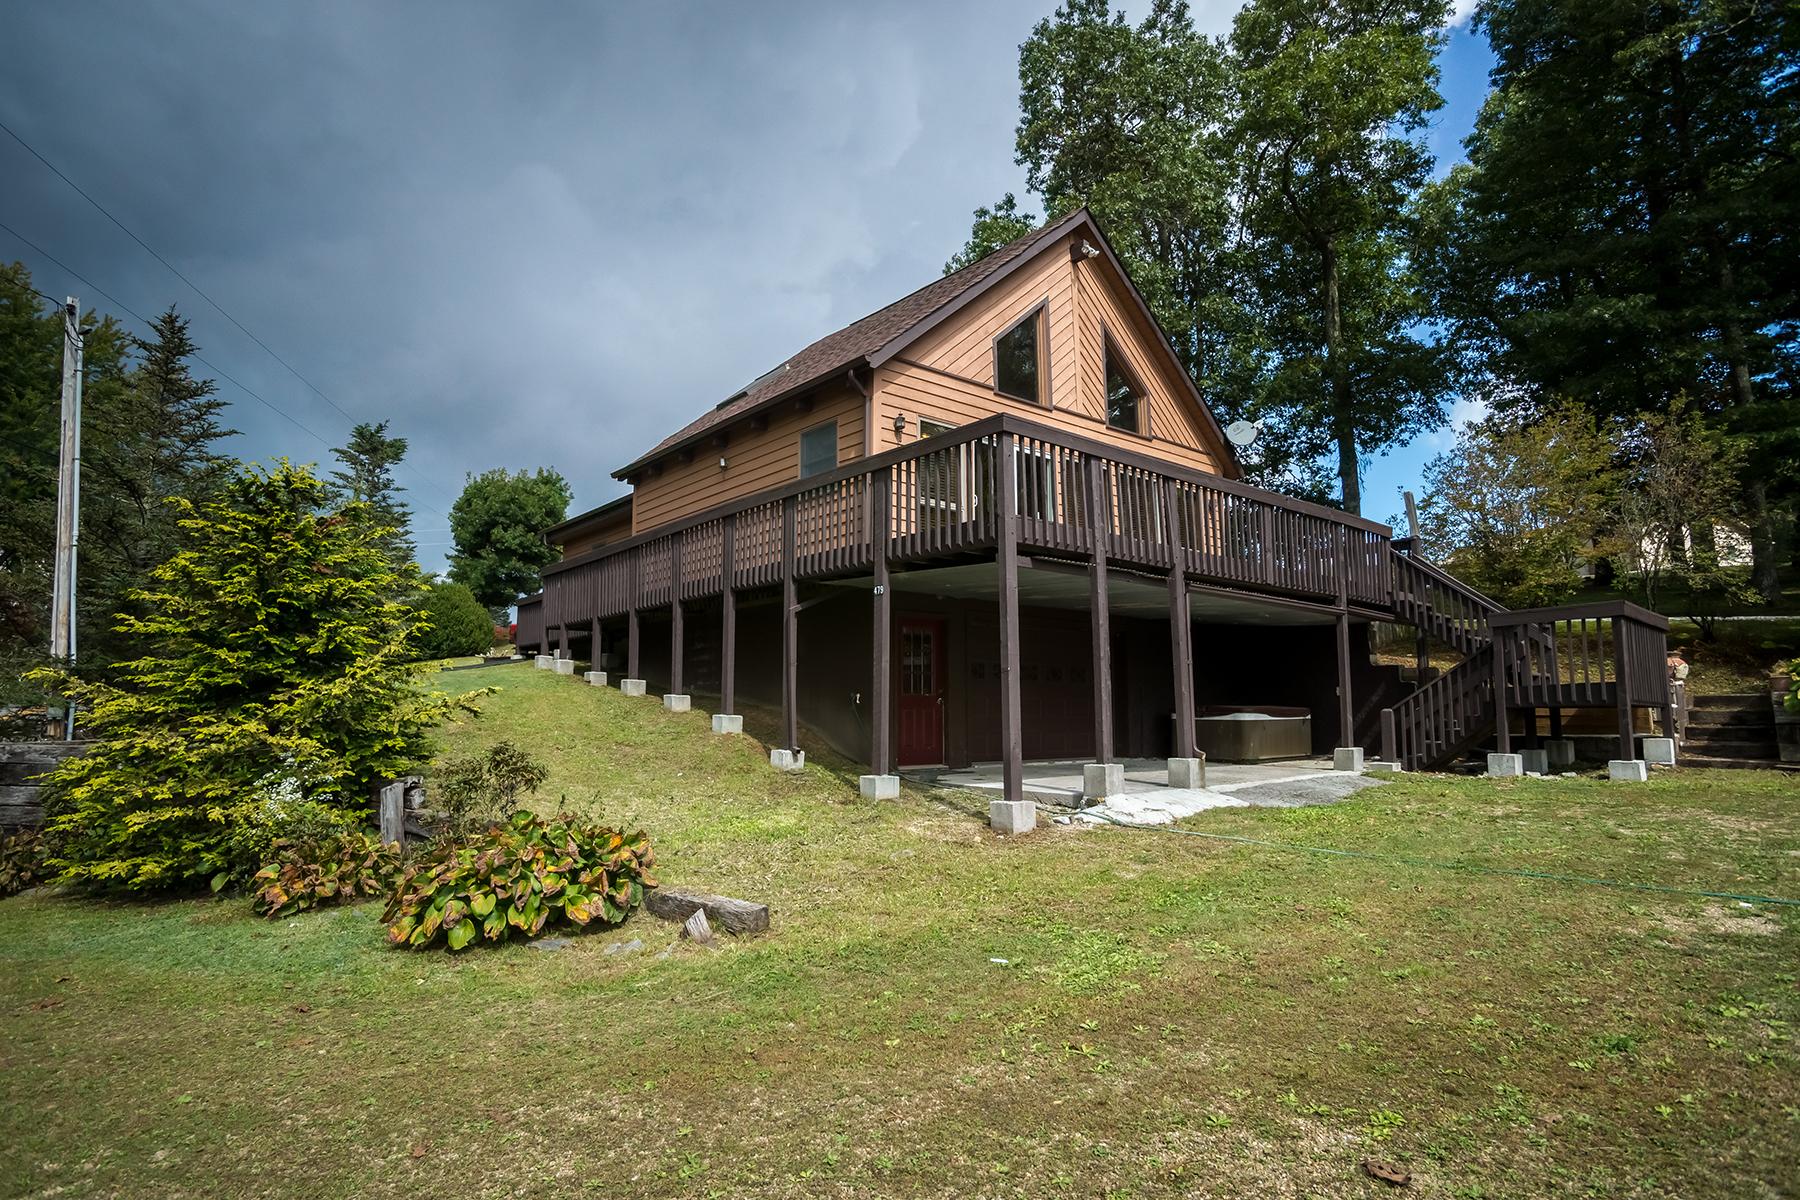 Single Family Home for Sale at NEWLAND 479 Pritchard Road Newland, North Carolina, 28657 United States